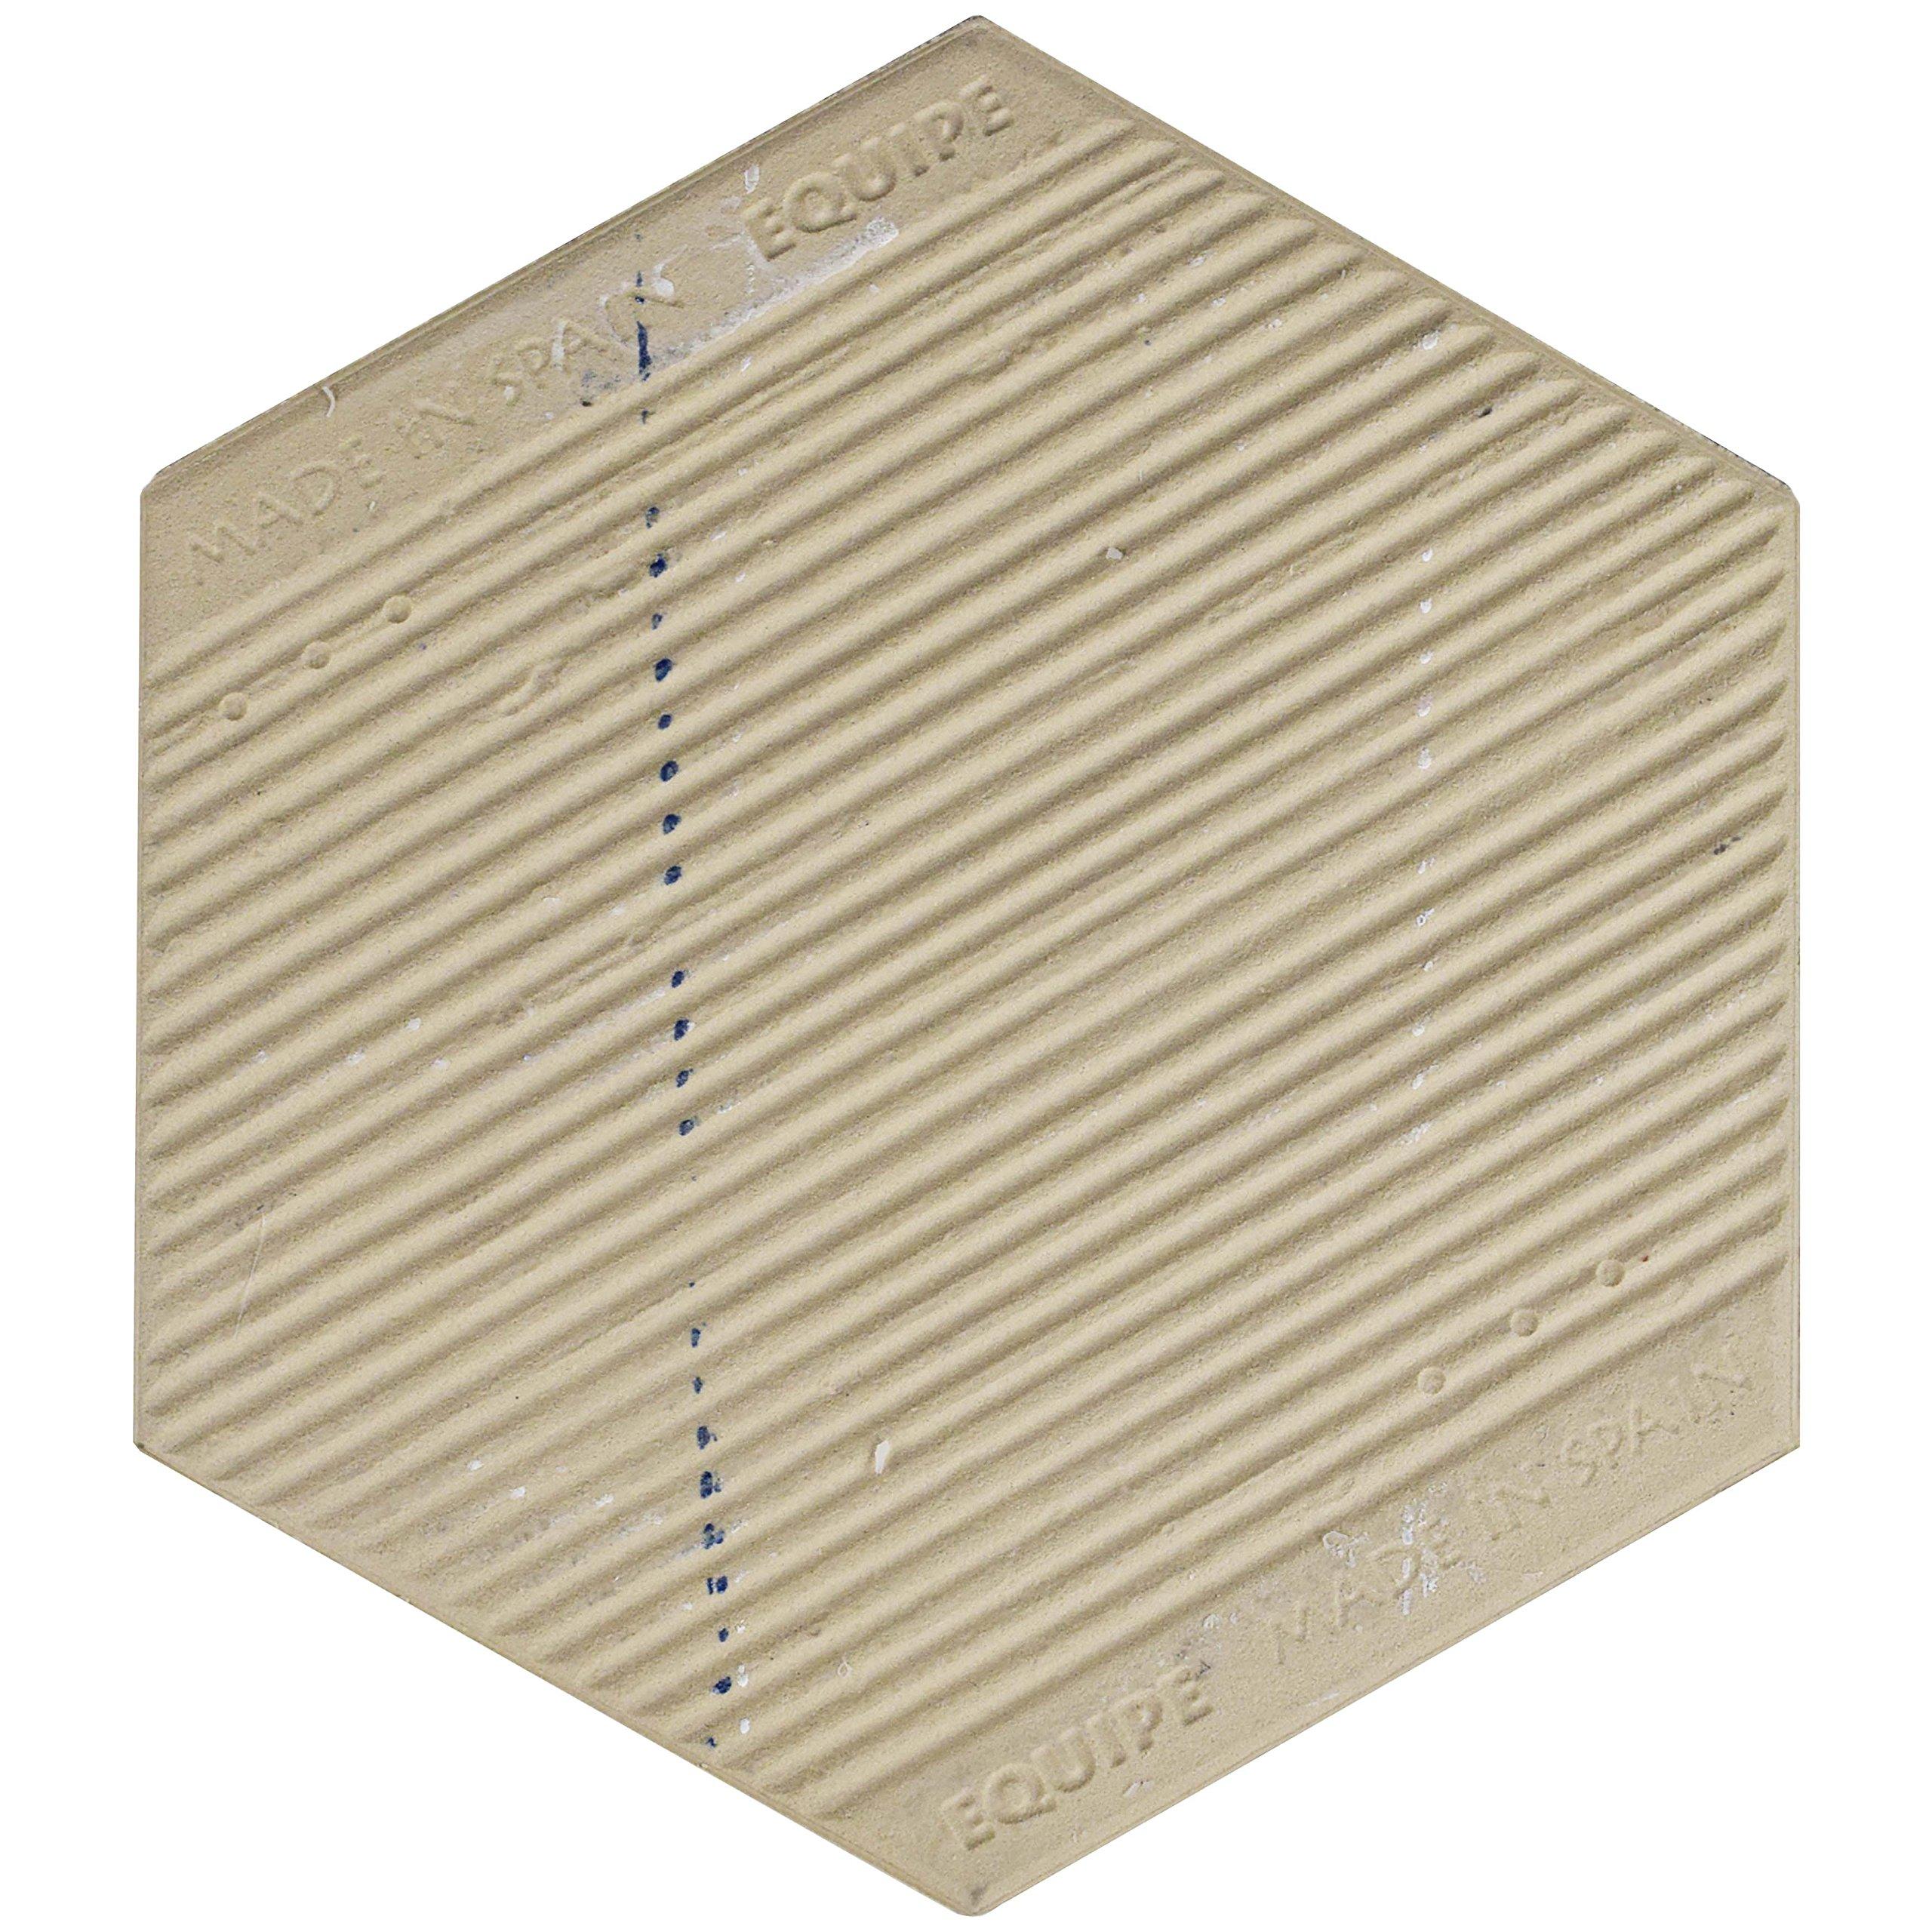 SomerTile FEQCRX Murmur Carrara Hexagon Porcelain Floor & Wall Tile, 7'' x 8'' (Pack of 25) by SOMERTILE (Image #4)